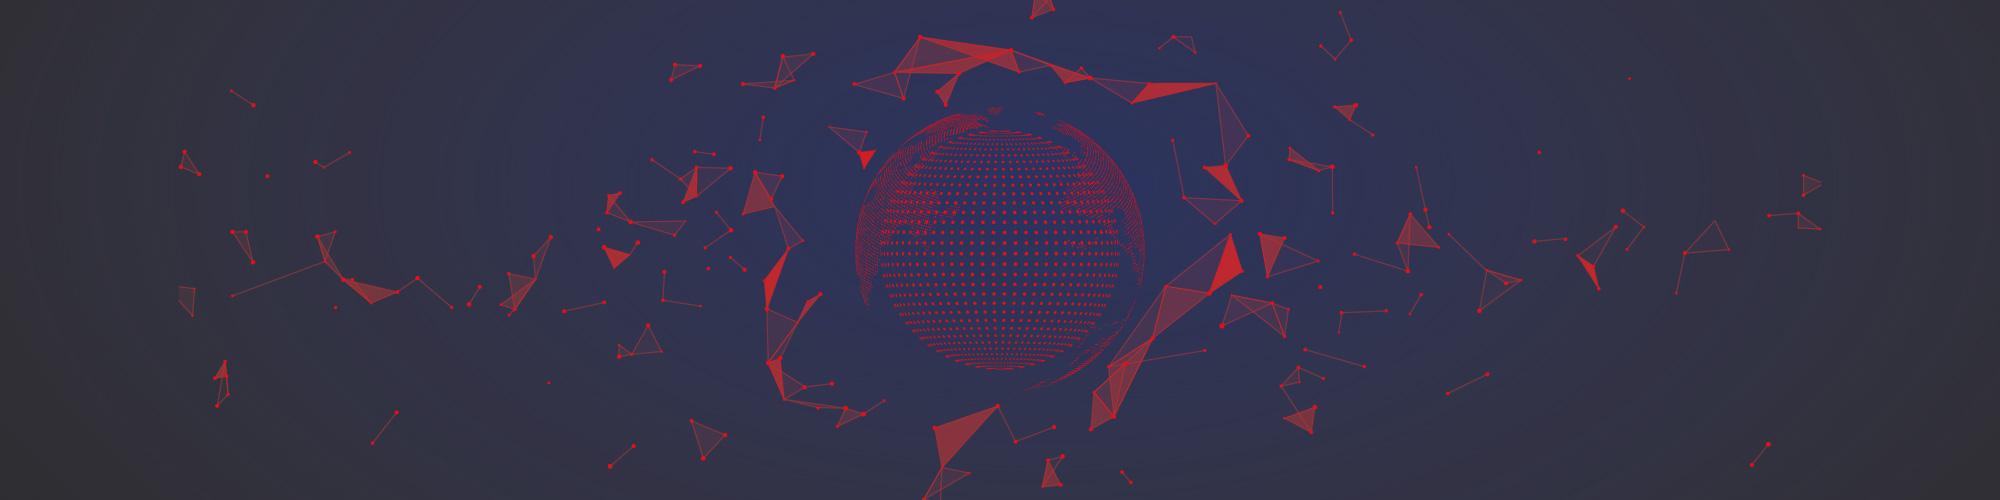 Events.banner.hero-wmsm2021v